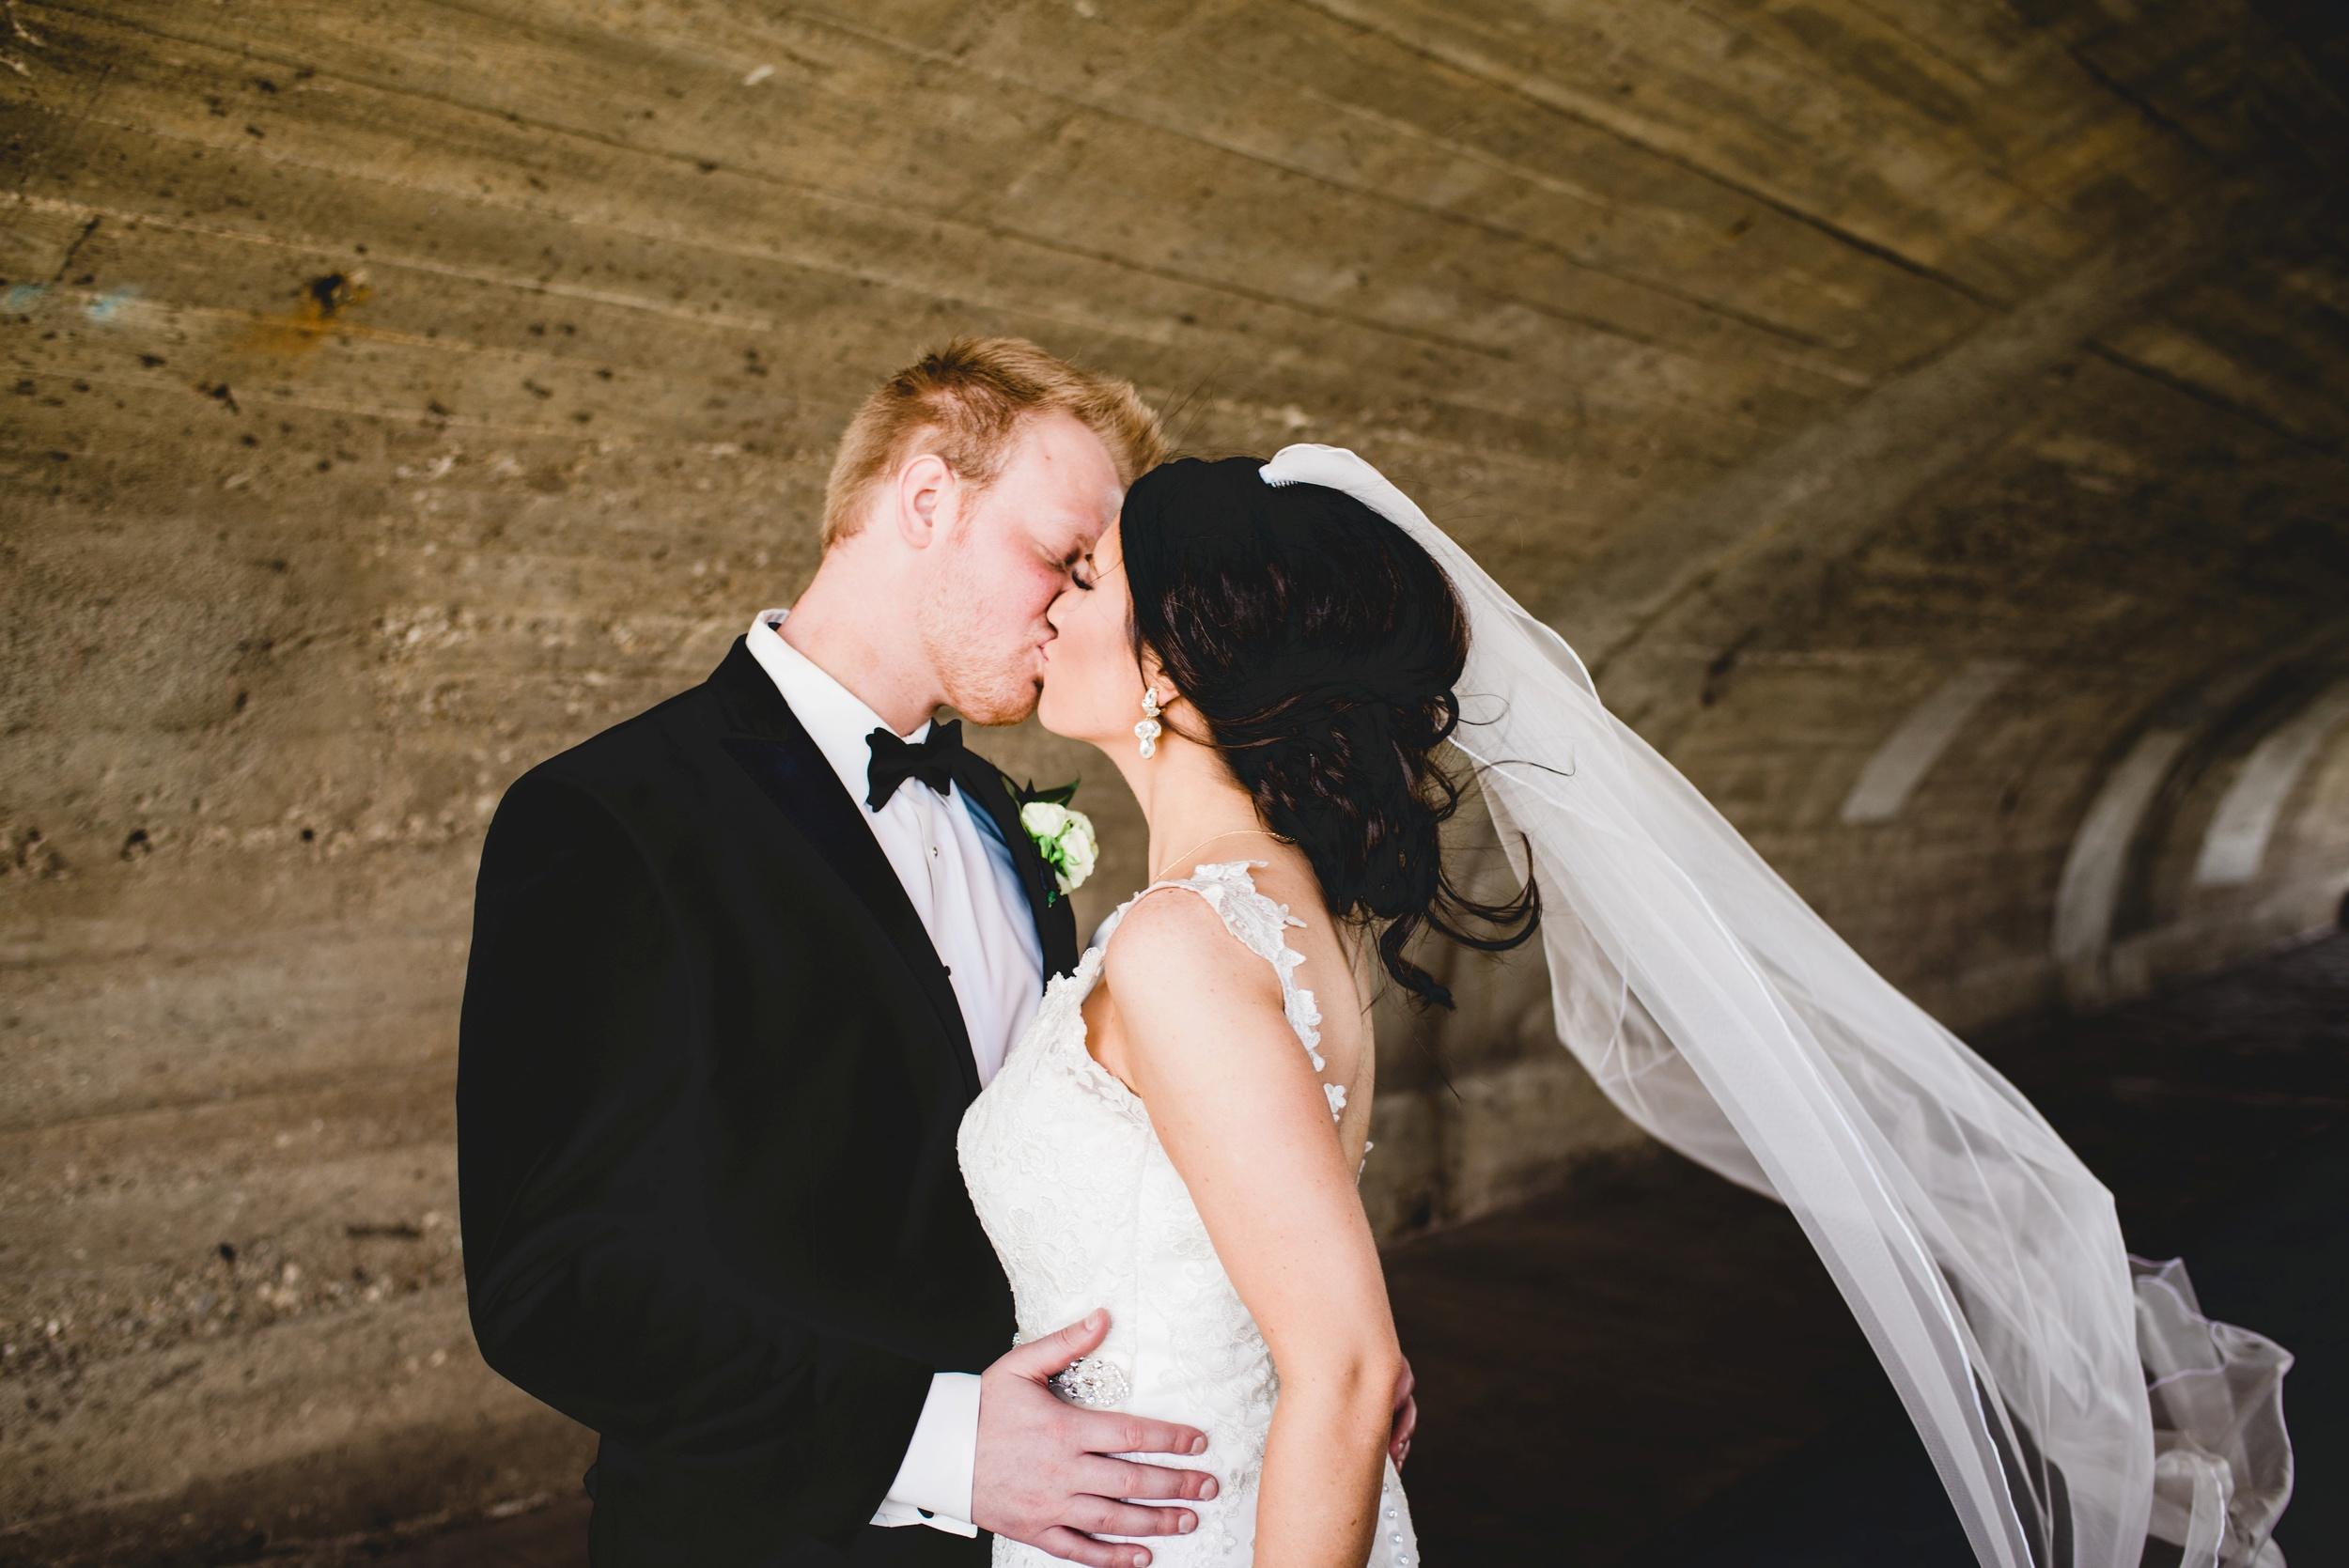 Downtown Des Moines Wedding Photographer_2090.jpg